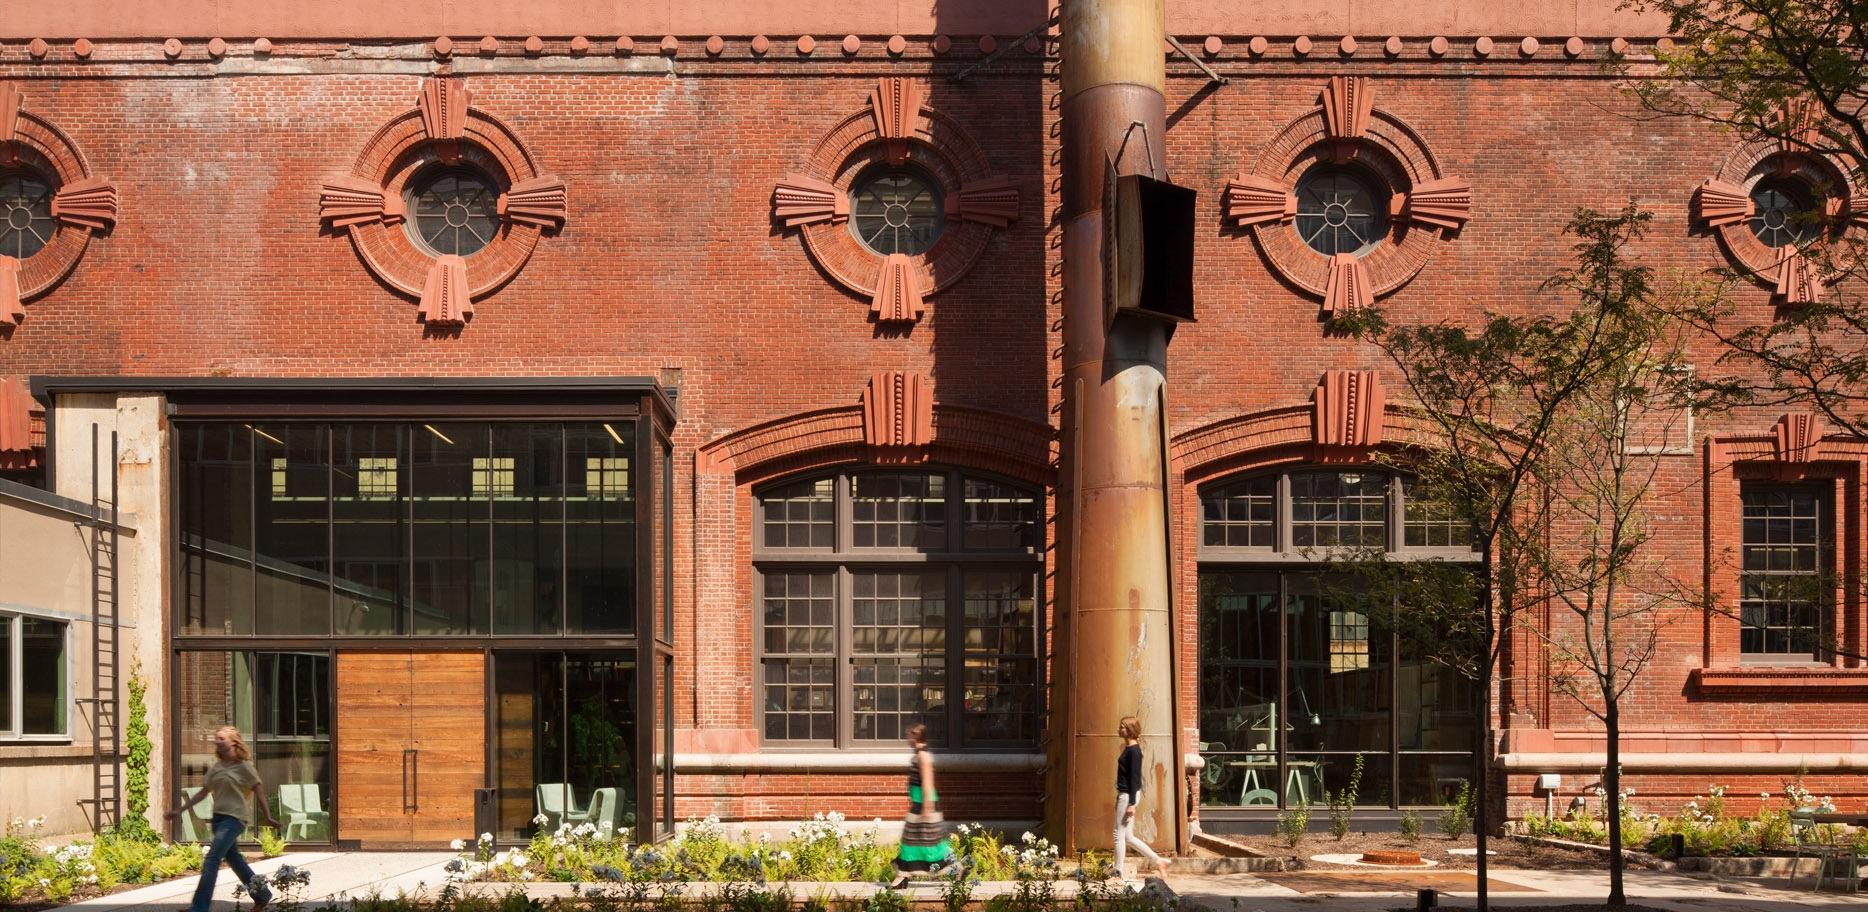 Dating buildings by bricks